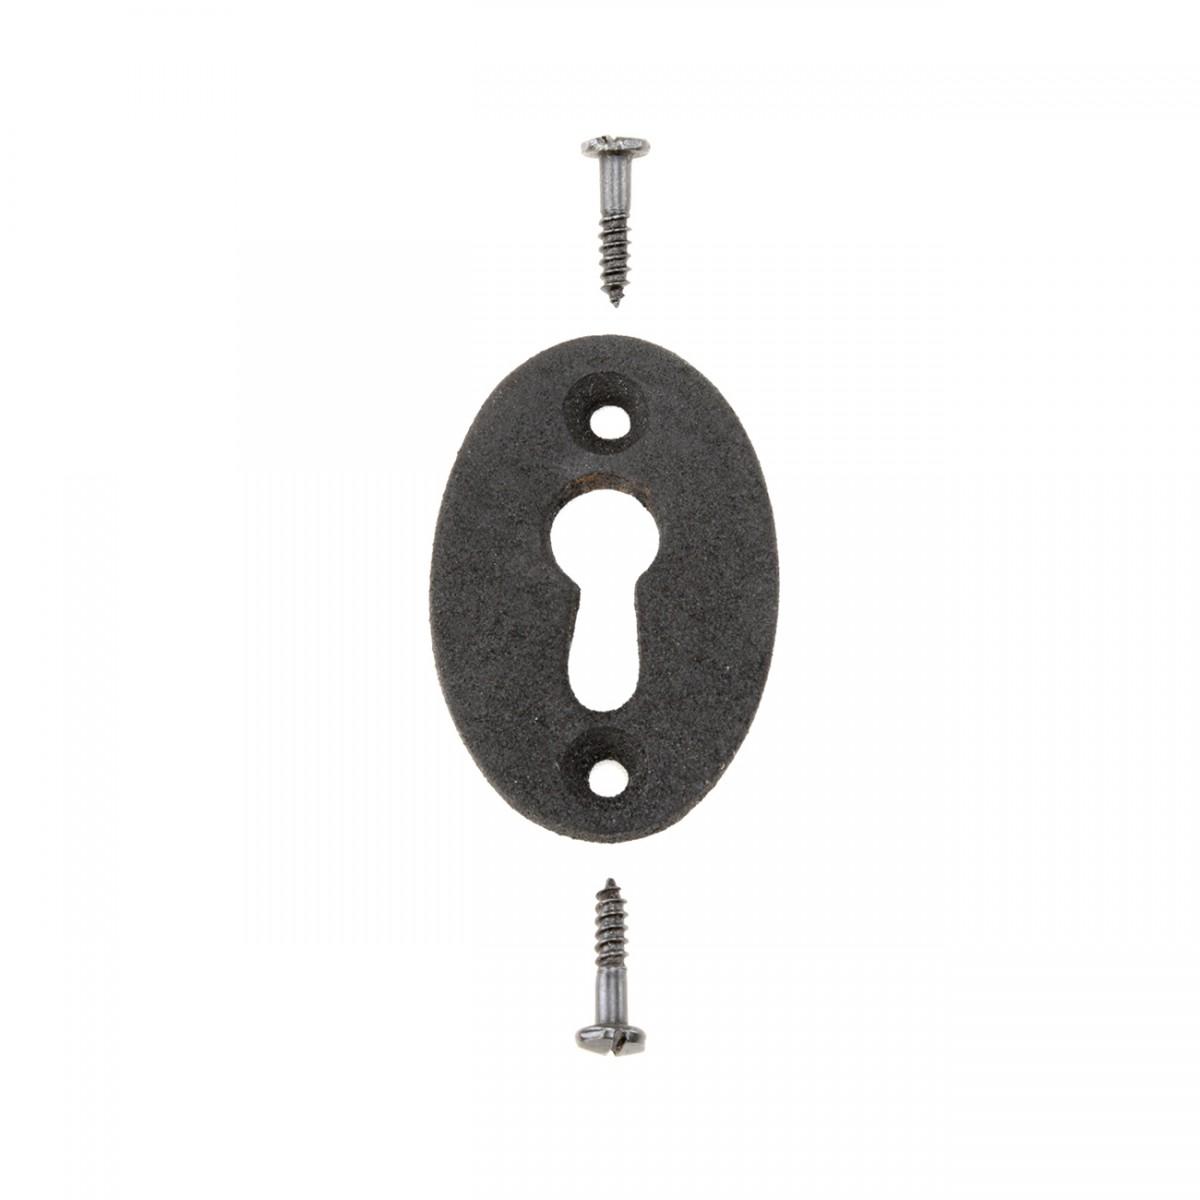 Wrought Iron Keyhole Cover Escutcheon Replacement 134 H Antique Keyhole Escutcheons Furniture Keyhole Escutcheons Keyhole Covers For Doors